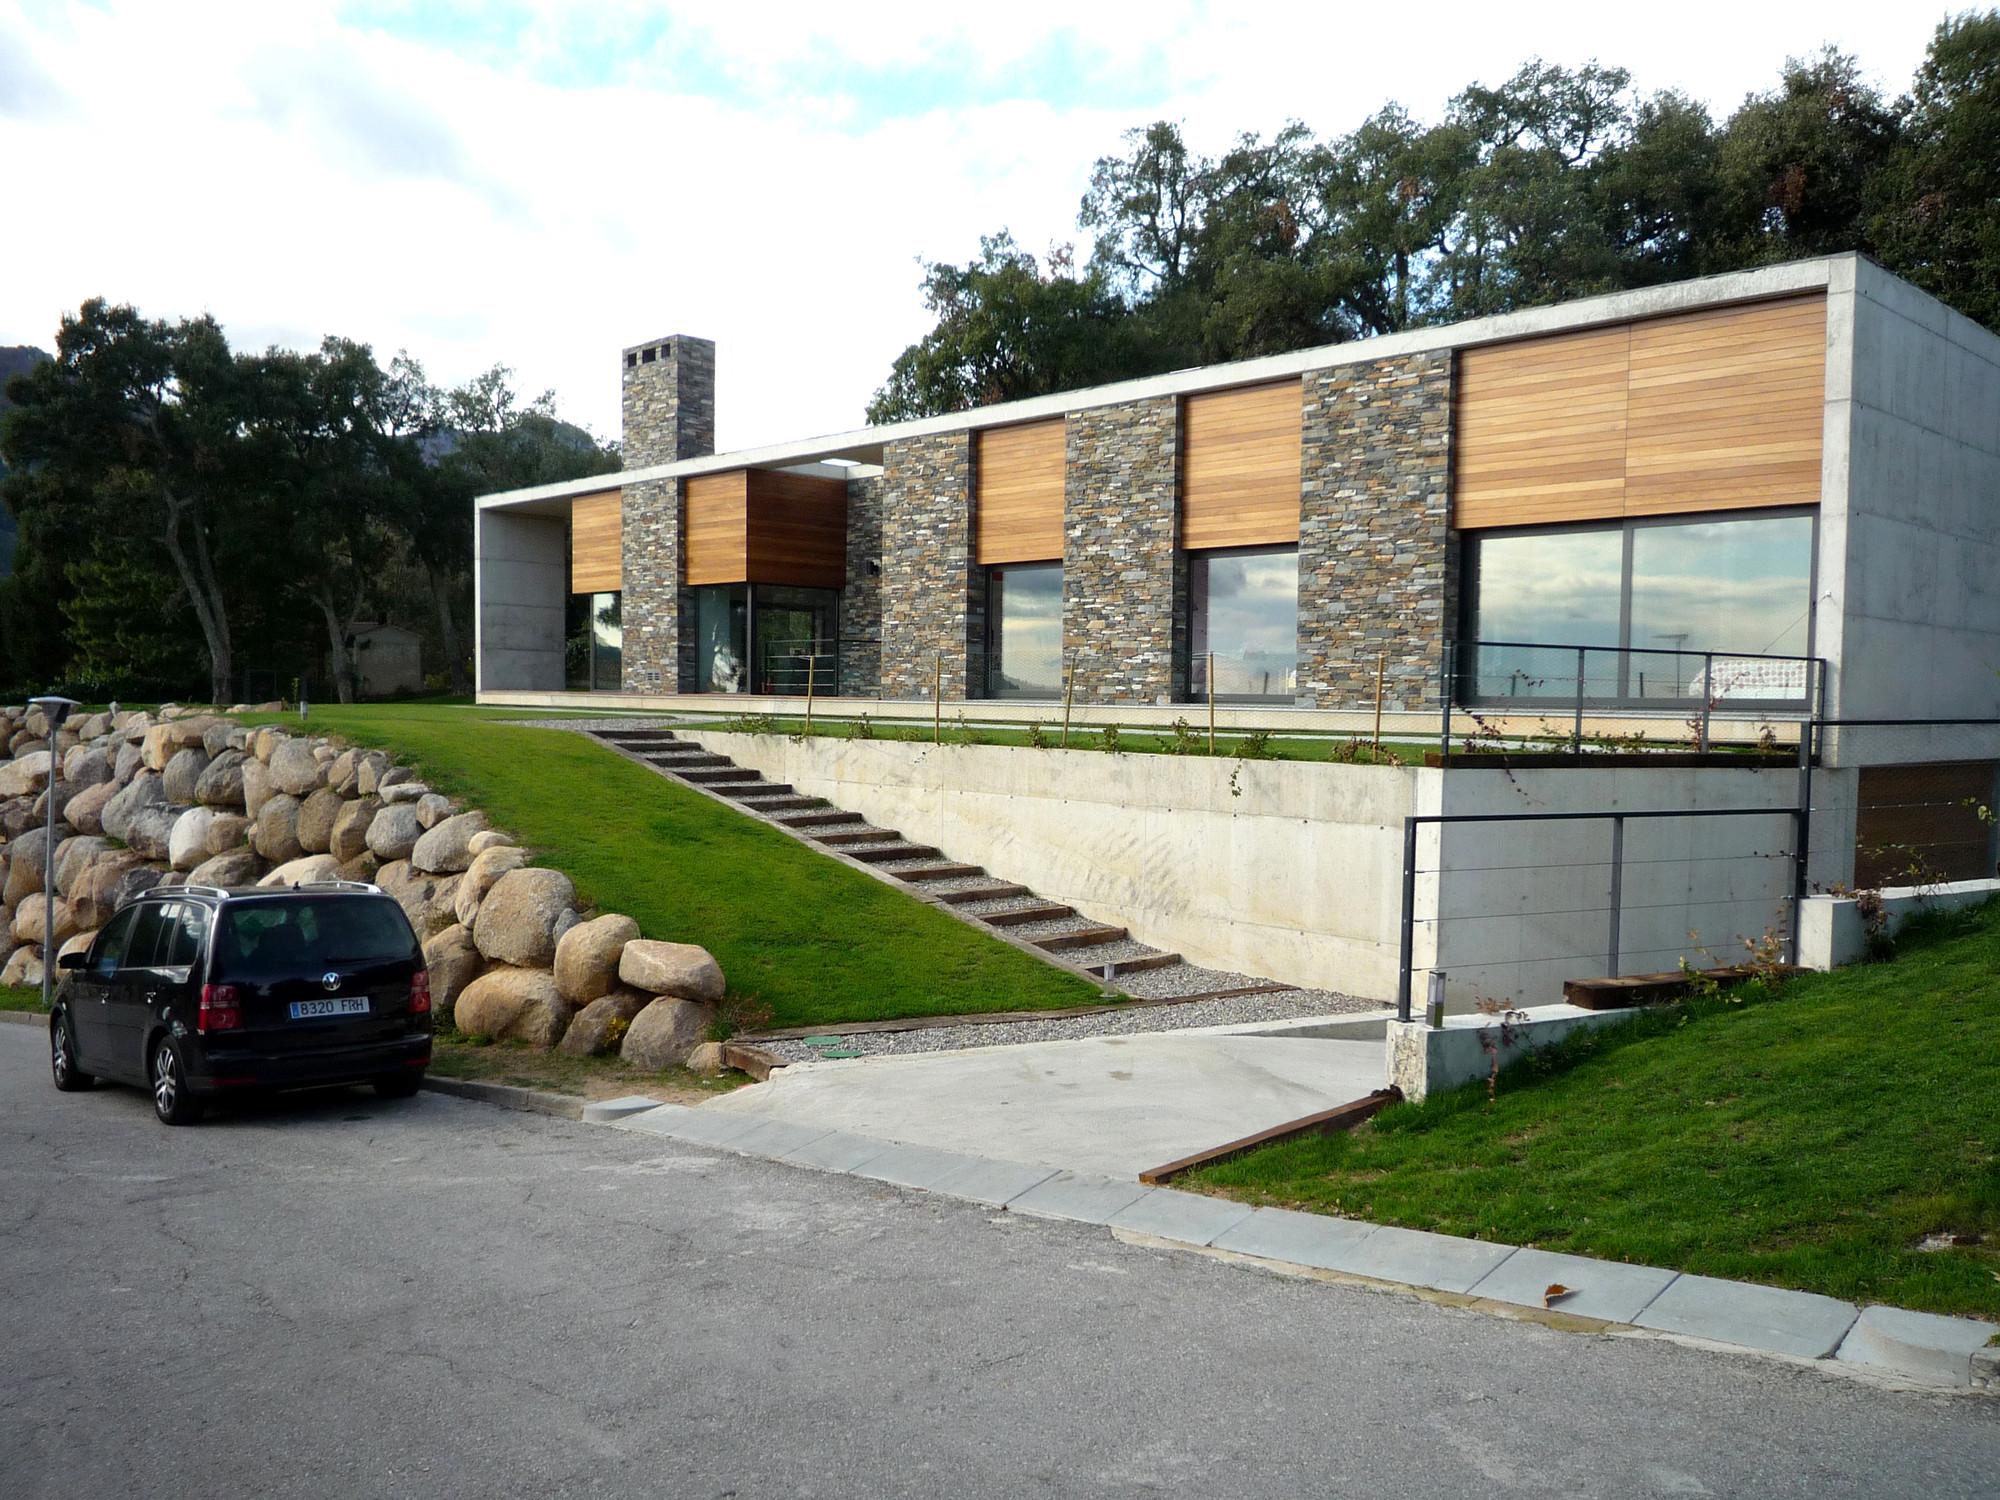 Resid ncia em montseny salas studio archdaily brasil for Casas modernas rectangulares